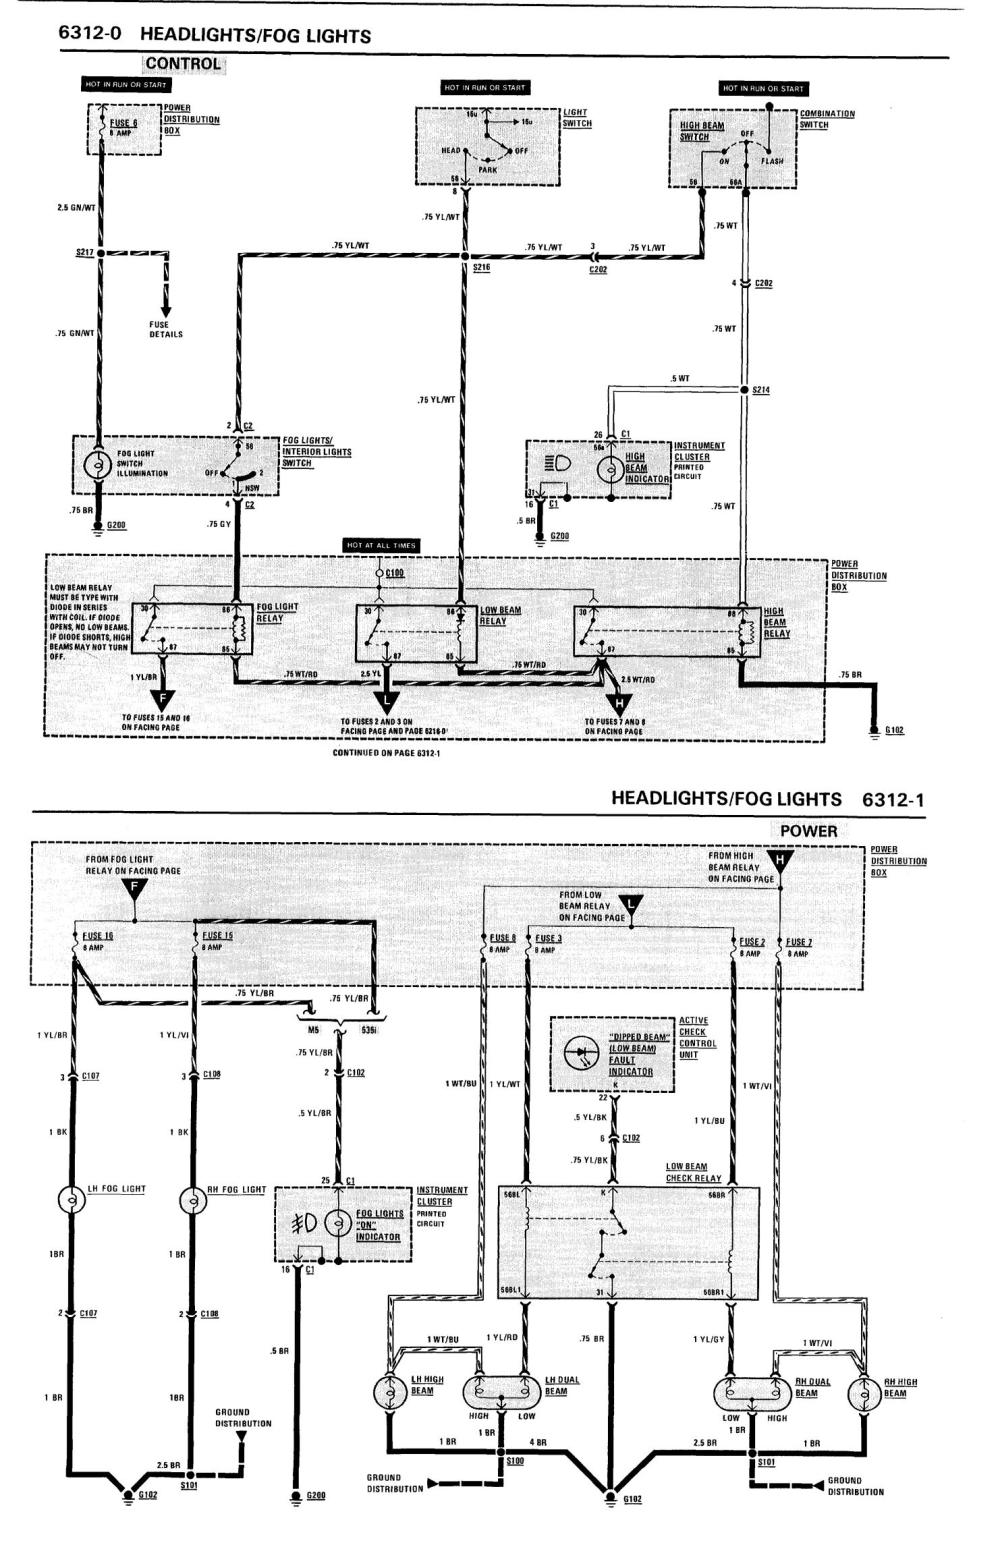 medium resolution of headlight wiring tech help please